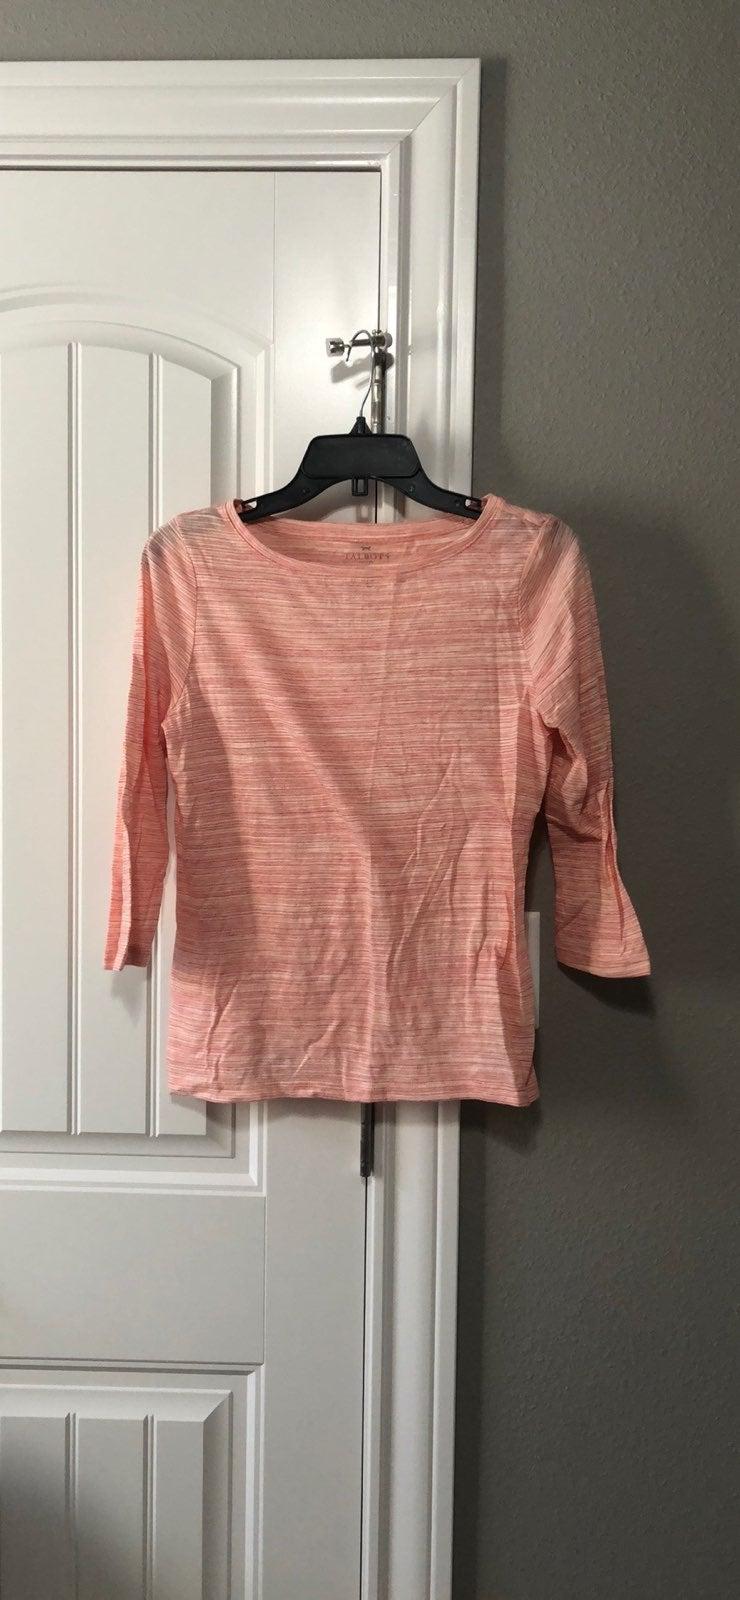 Talbots quarter sleeve tee shirt